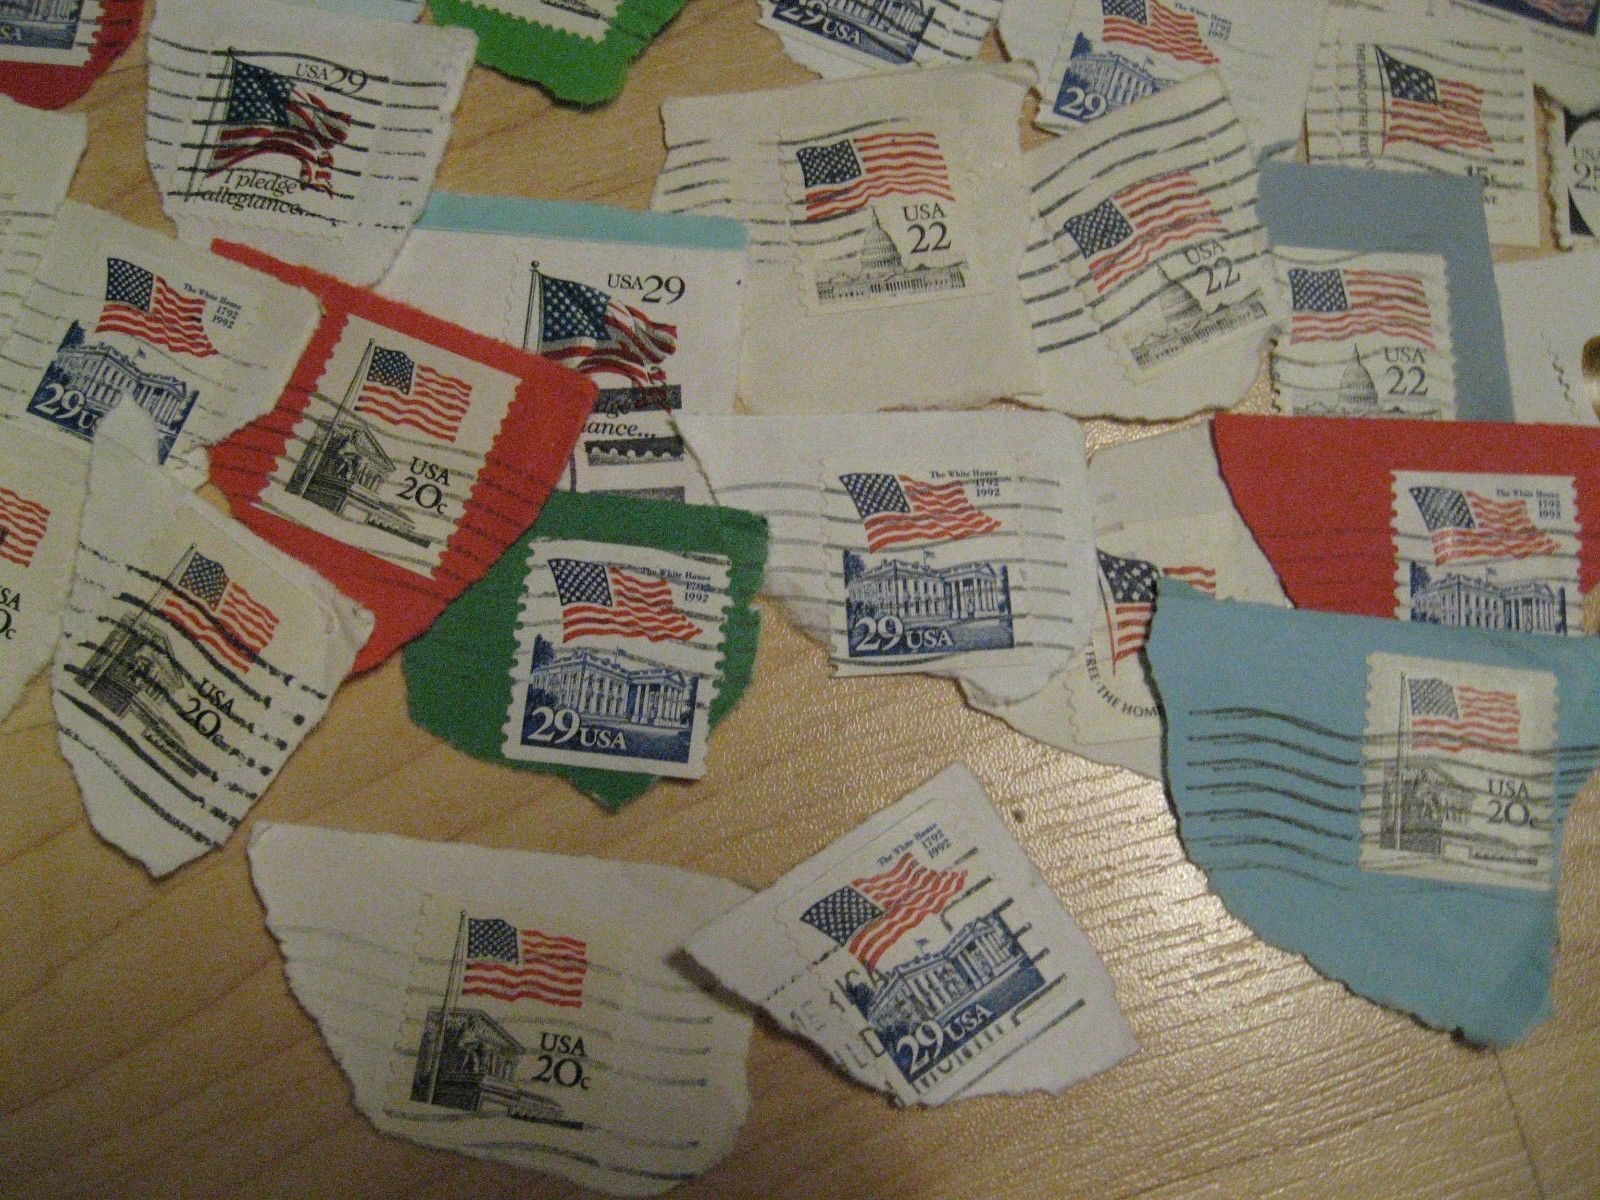 USA Flags Postage Stamps - Vintage 1980's American Postal USPS Stamps Set (100)